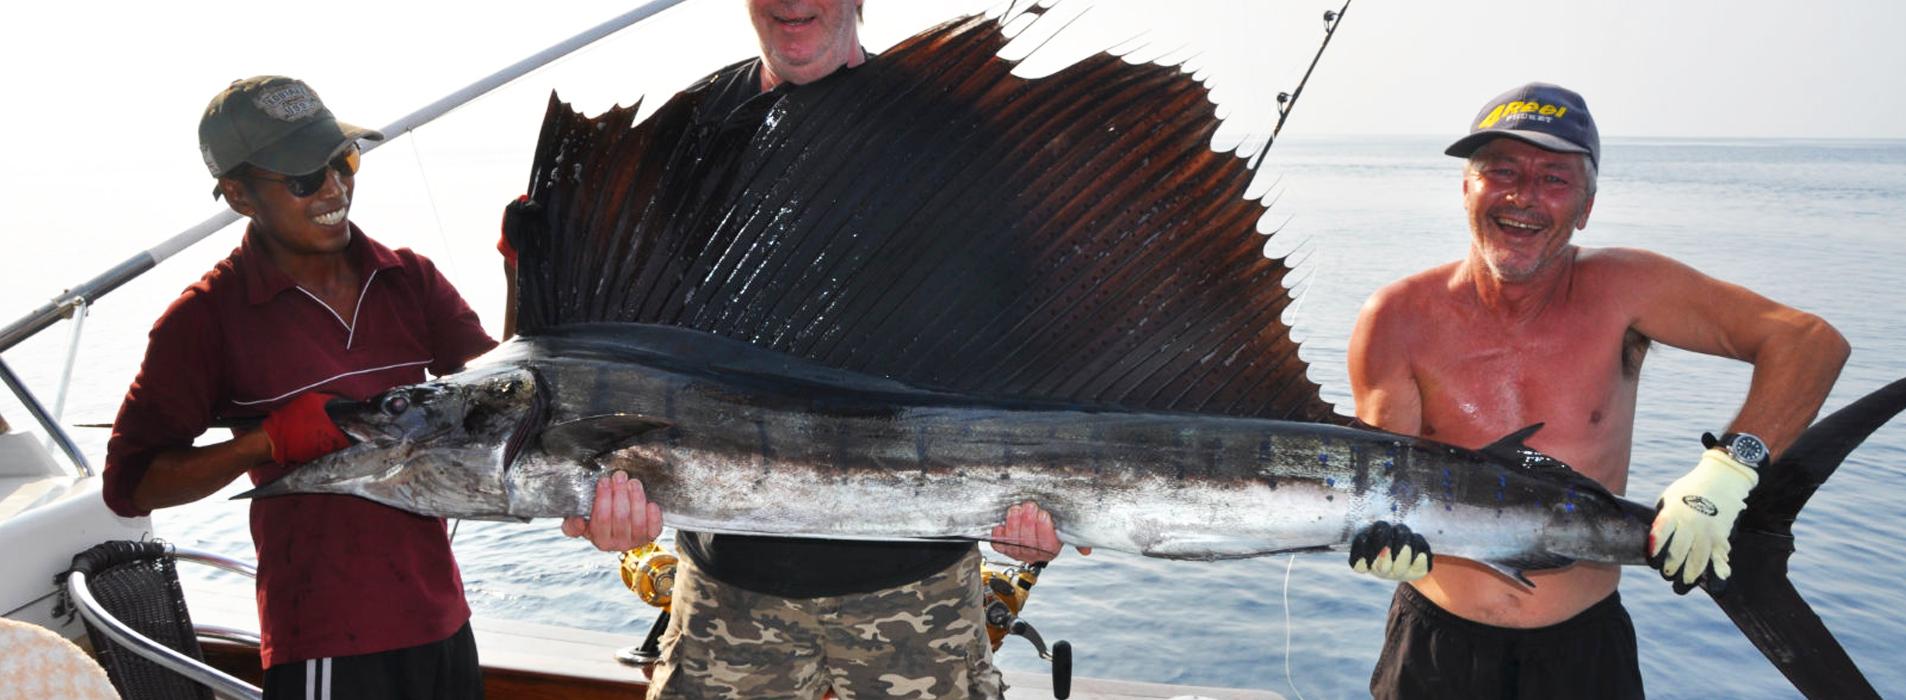 Sailfish caught in waters off Phuket